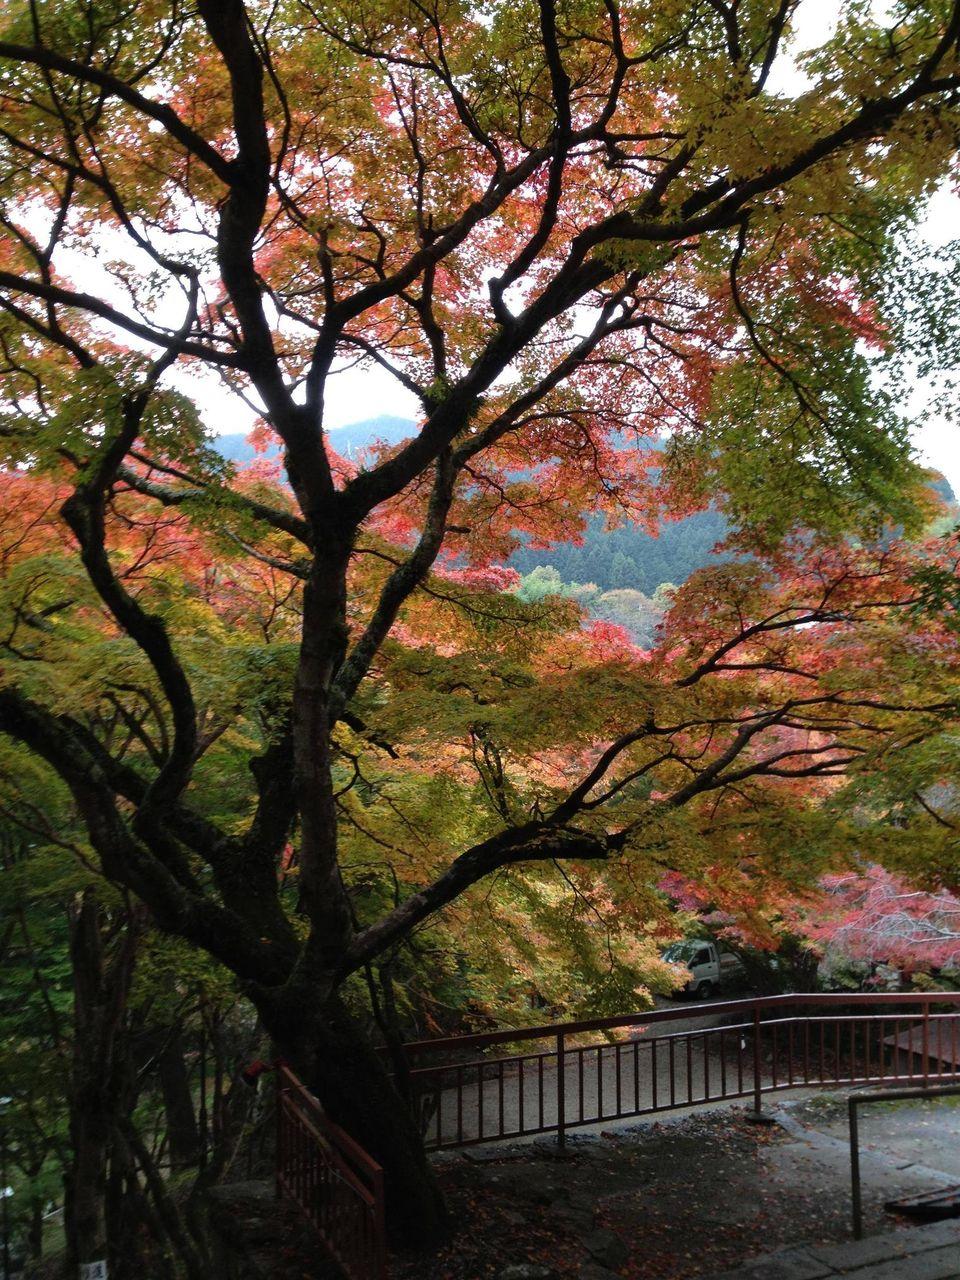 http://livedoor.blogimg.jp/xmatometestx/imgs/a/0/a0f6fbf1.jpg